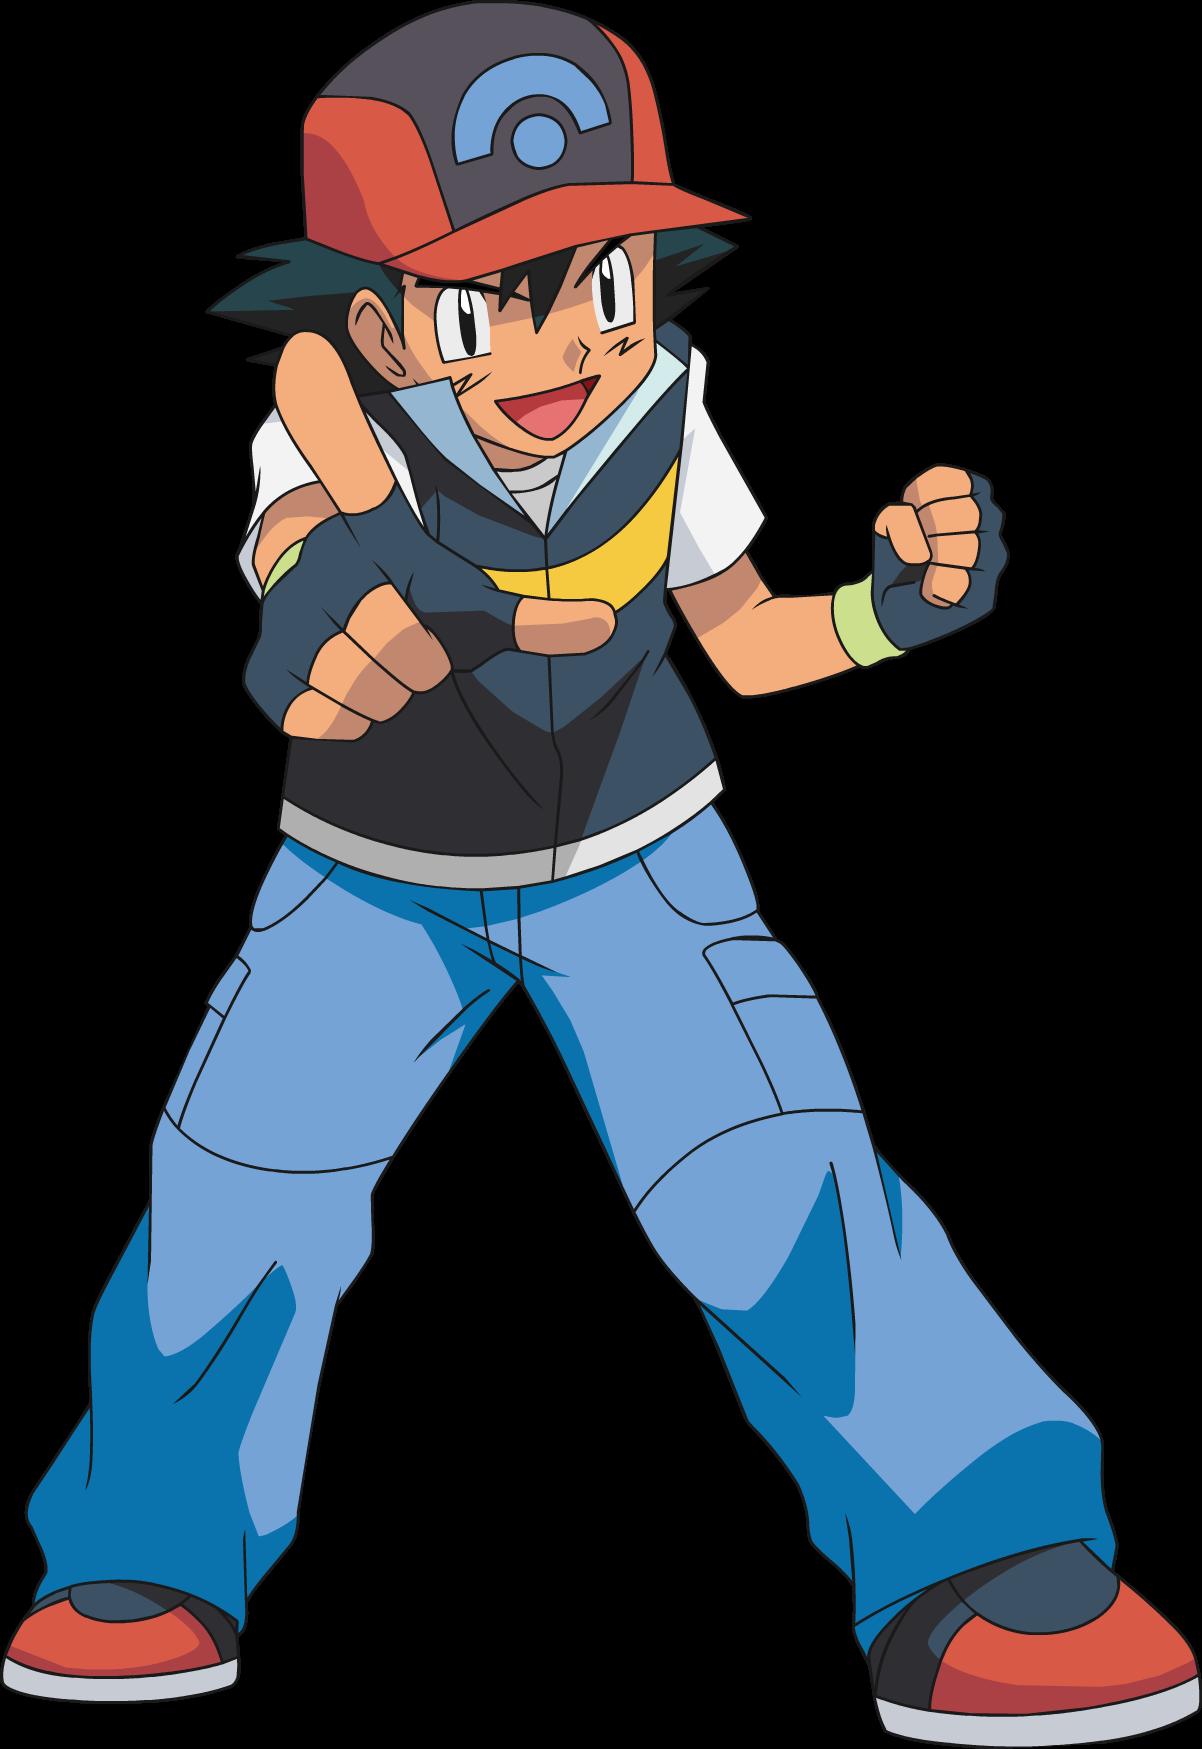 Nail clipart claw hammer. Respect buizel pokemon anime